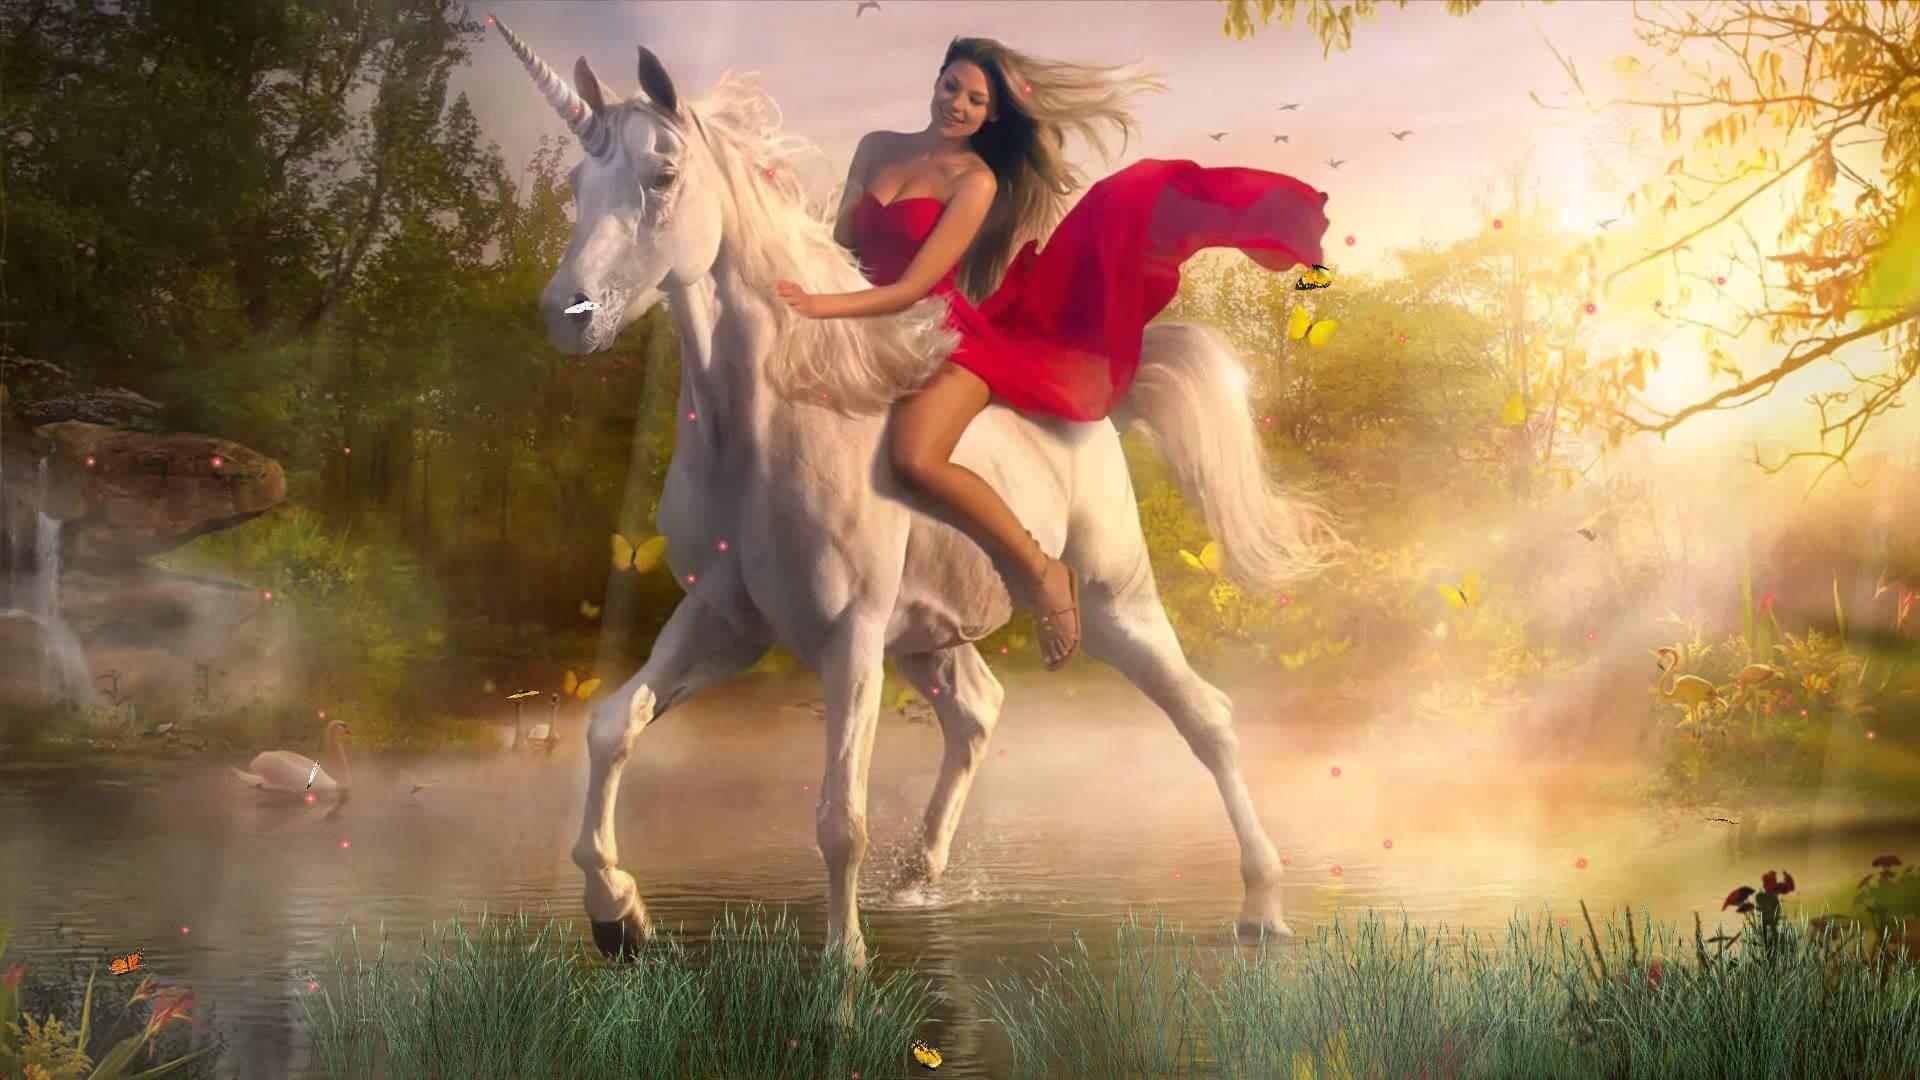 Magic Unicorns Animated Wallpaper https://www.desktopanimated.com